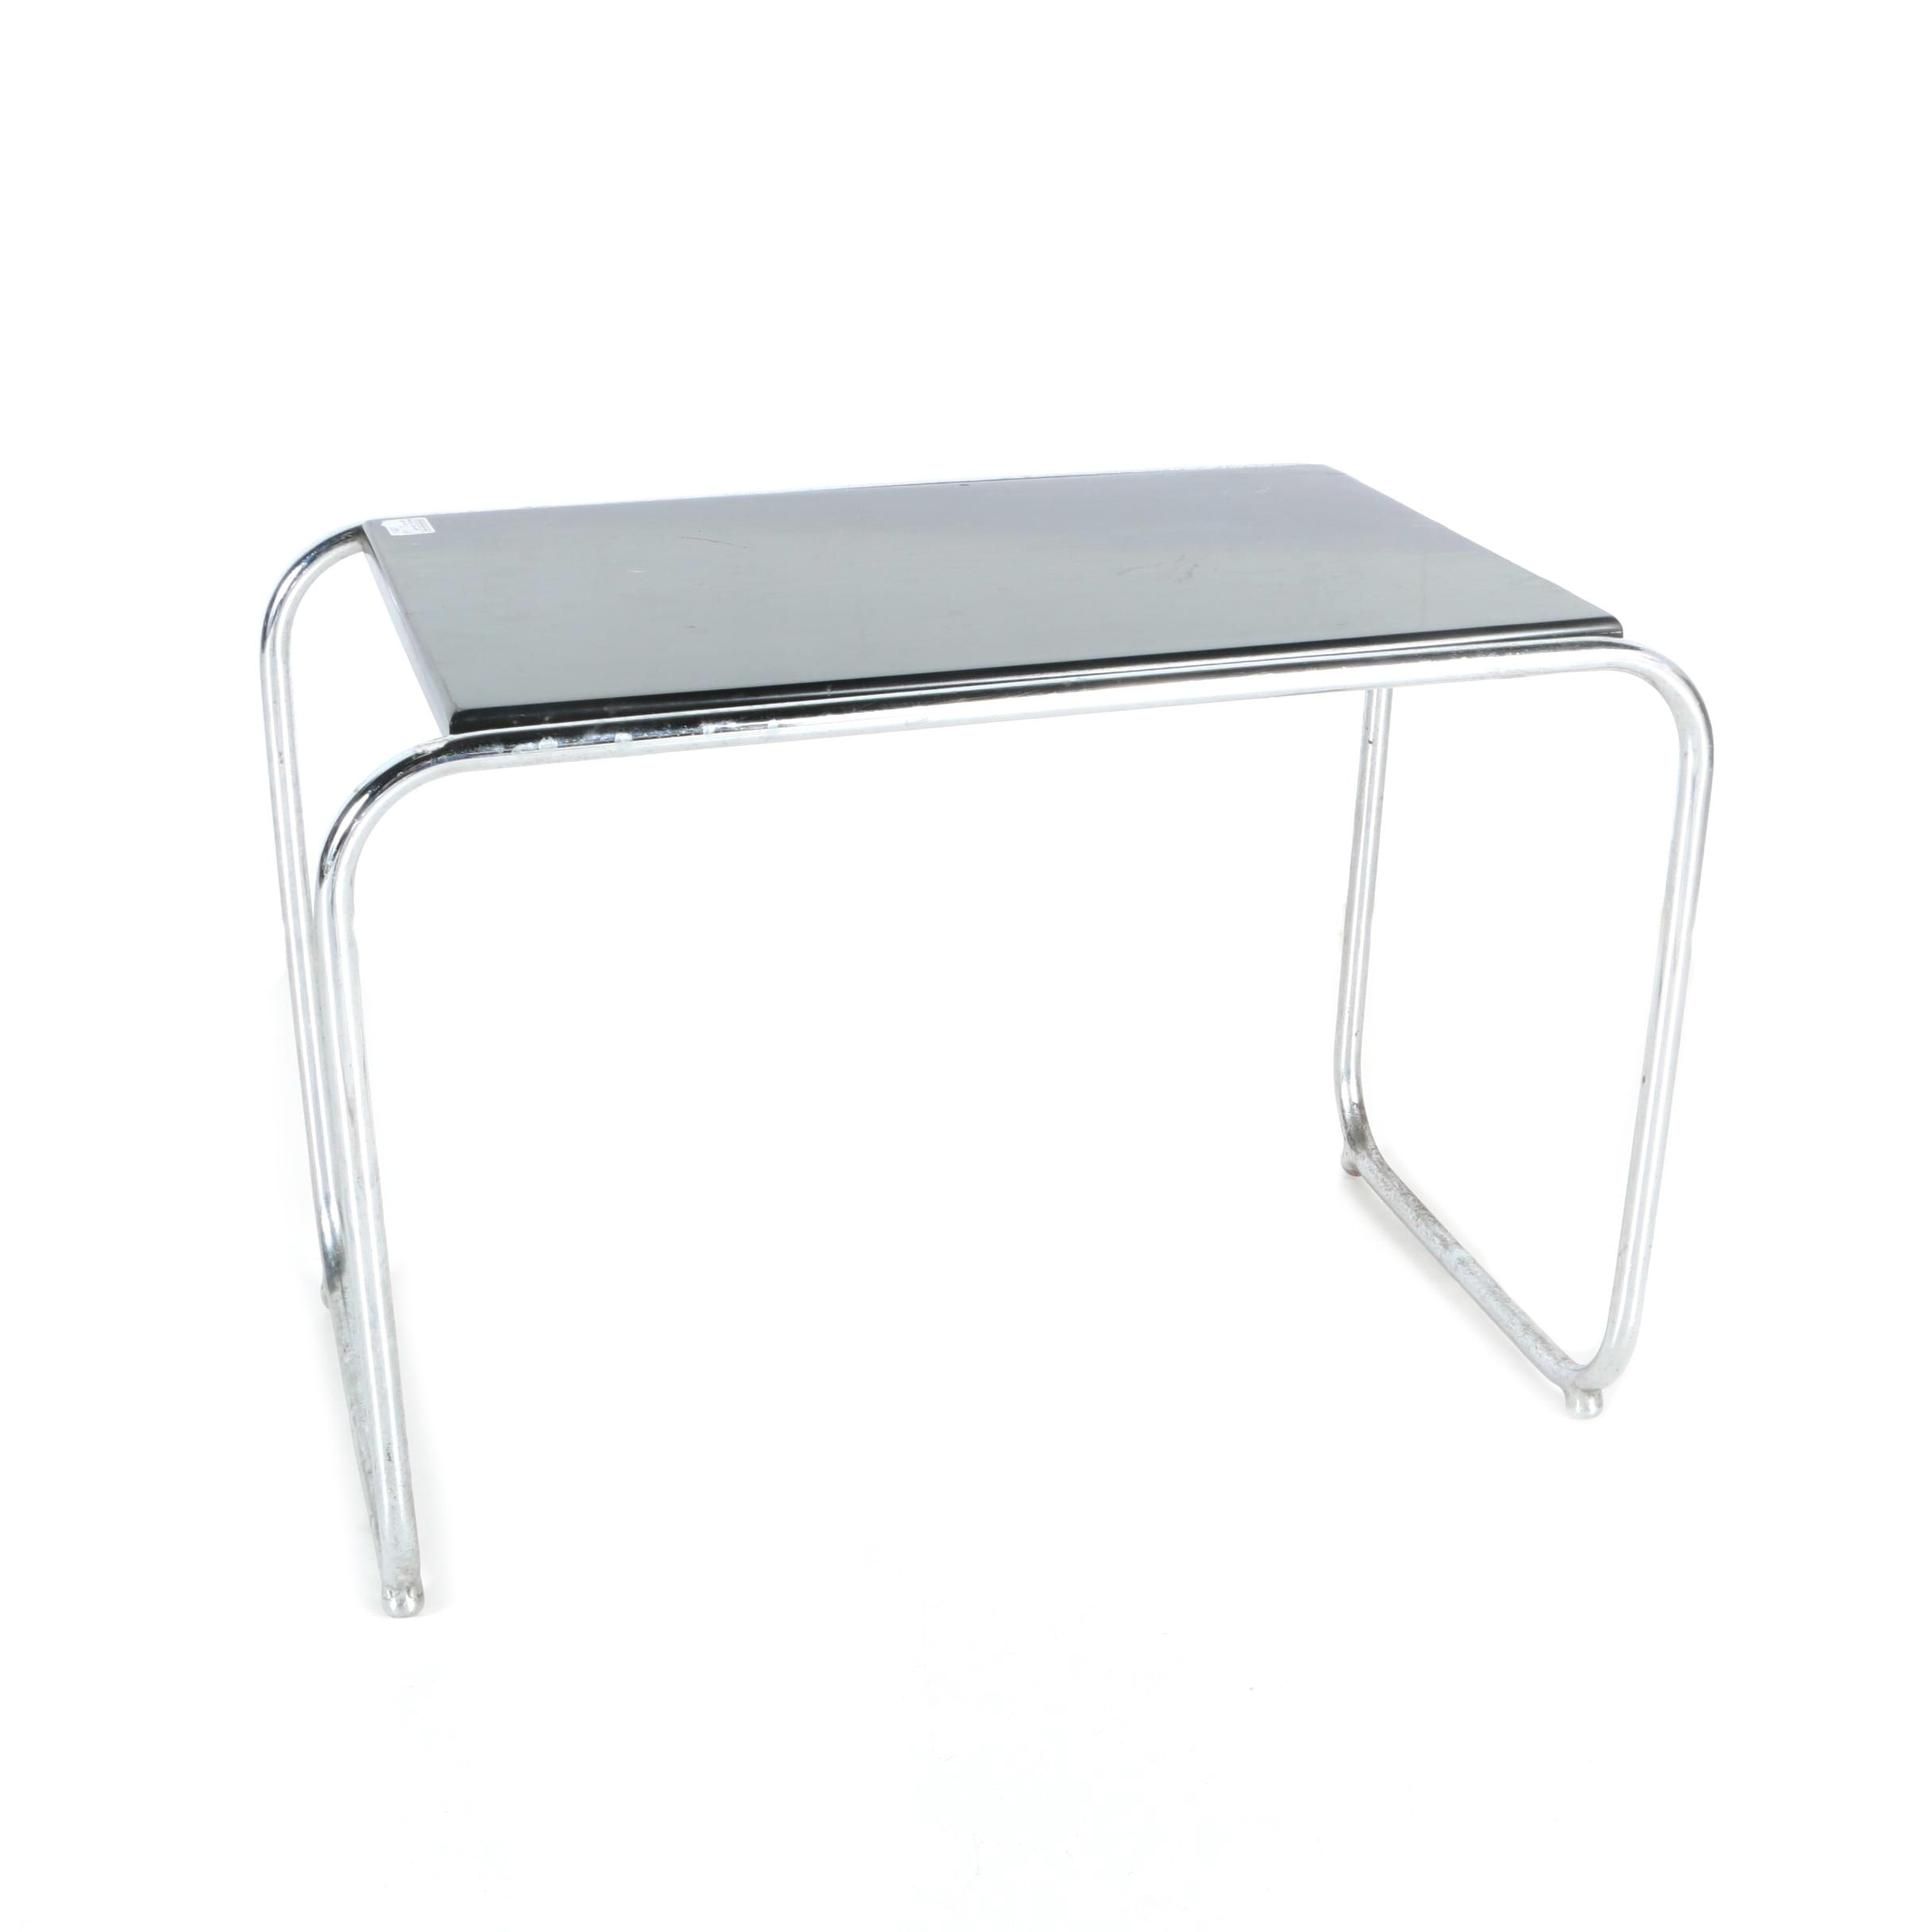 "Mid Century Modern Marcel Breuer ""Laccio"" End Table"